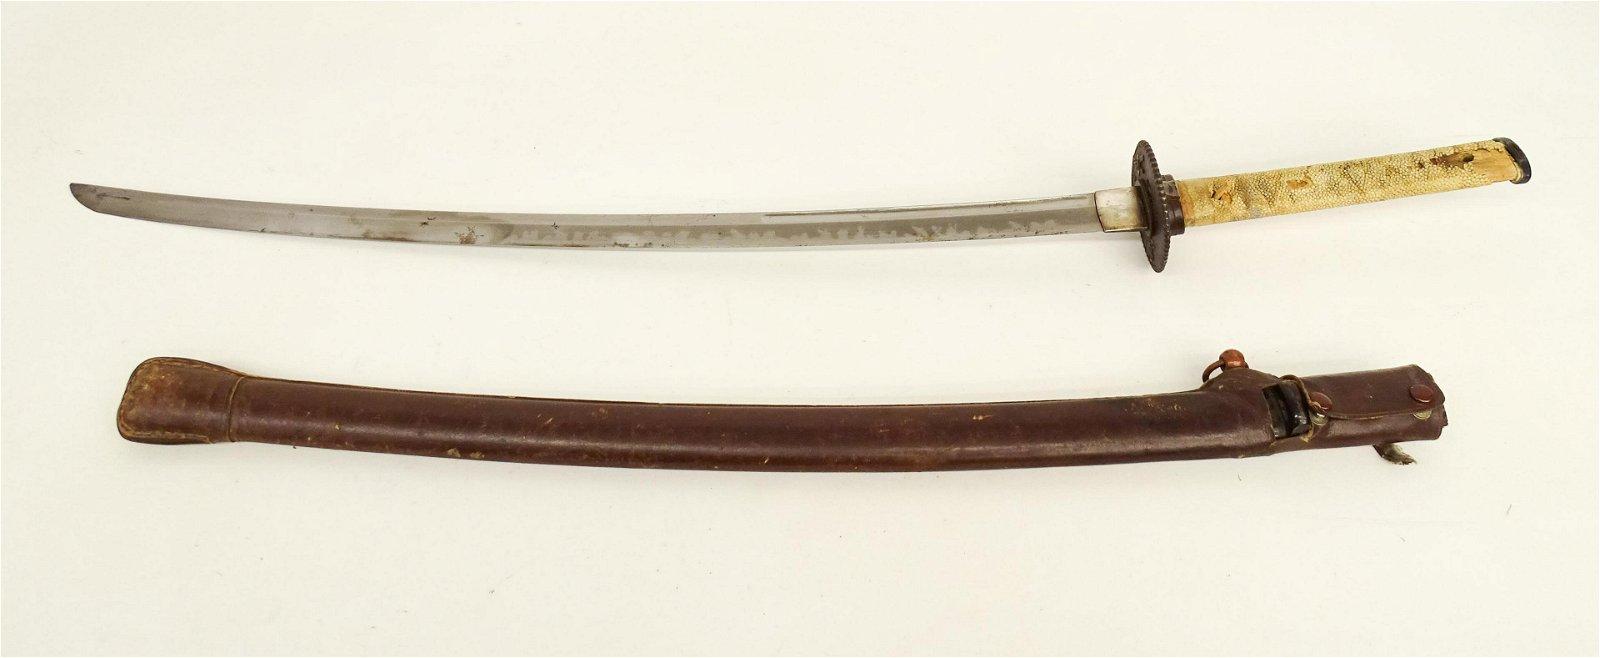 Early Japanese Sword